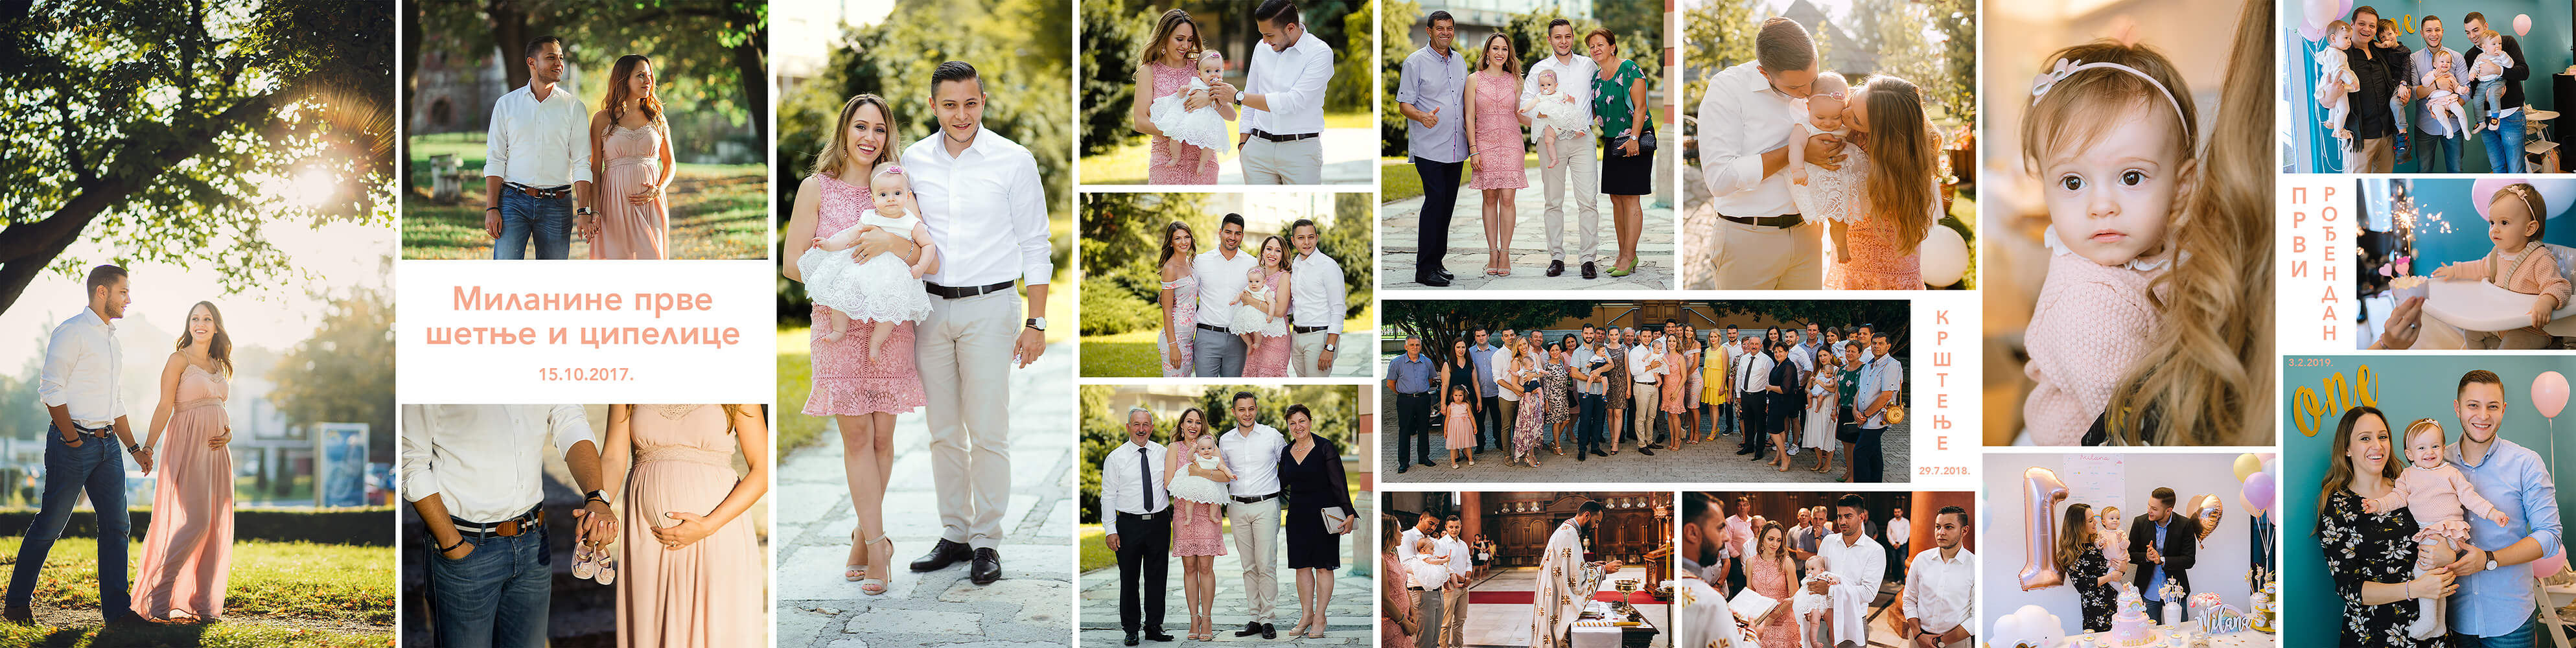 FAMILY PHOTOS - LEON BIJELIC PHOTOGRAPHY - BANJA LUKA - PORODIČNE FOTOGRAFIJE - PORODIČNI FOTOGRAF - KRSTENJE - RODJENDAN